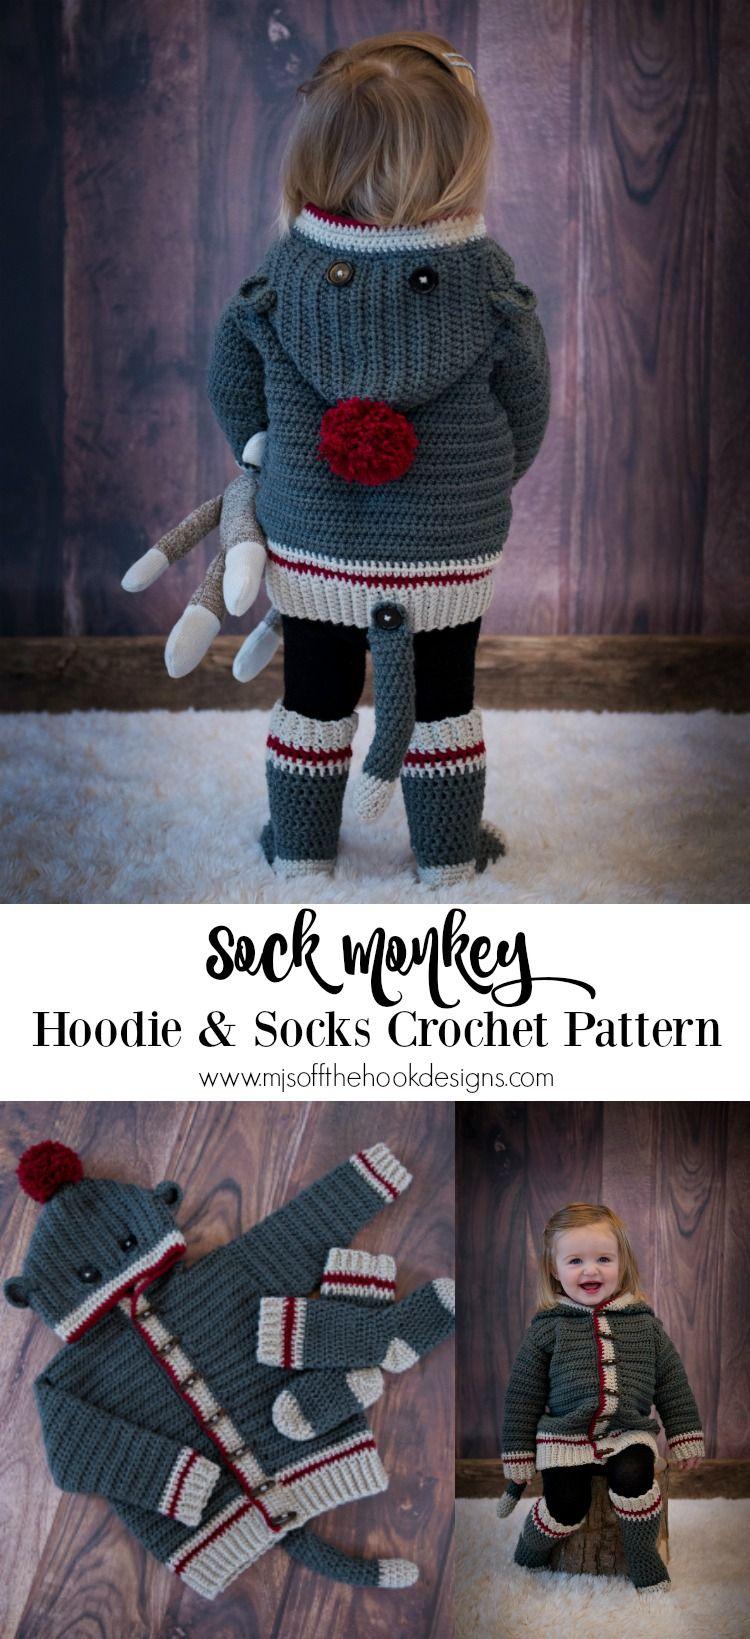 9ec96a9f5 How to Crochet Sock Monkey Hoodie